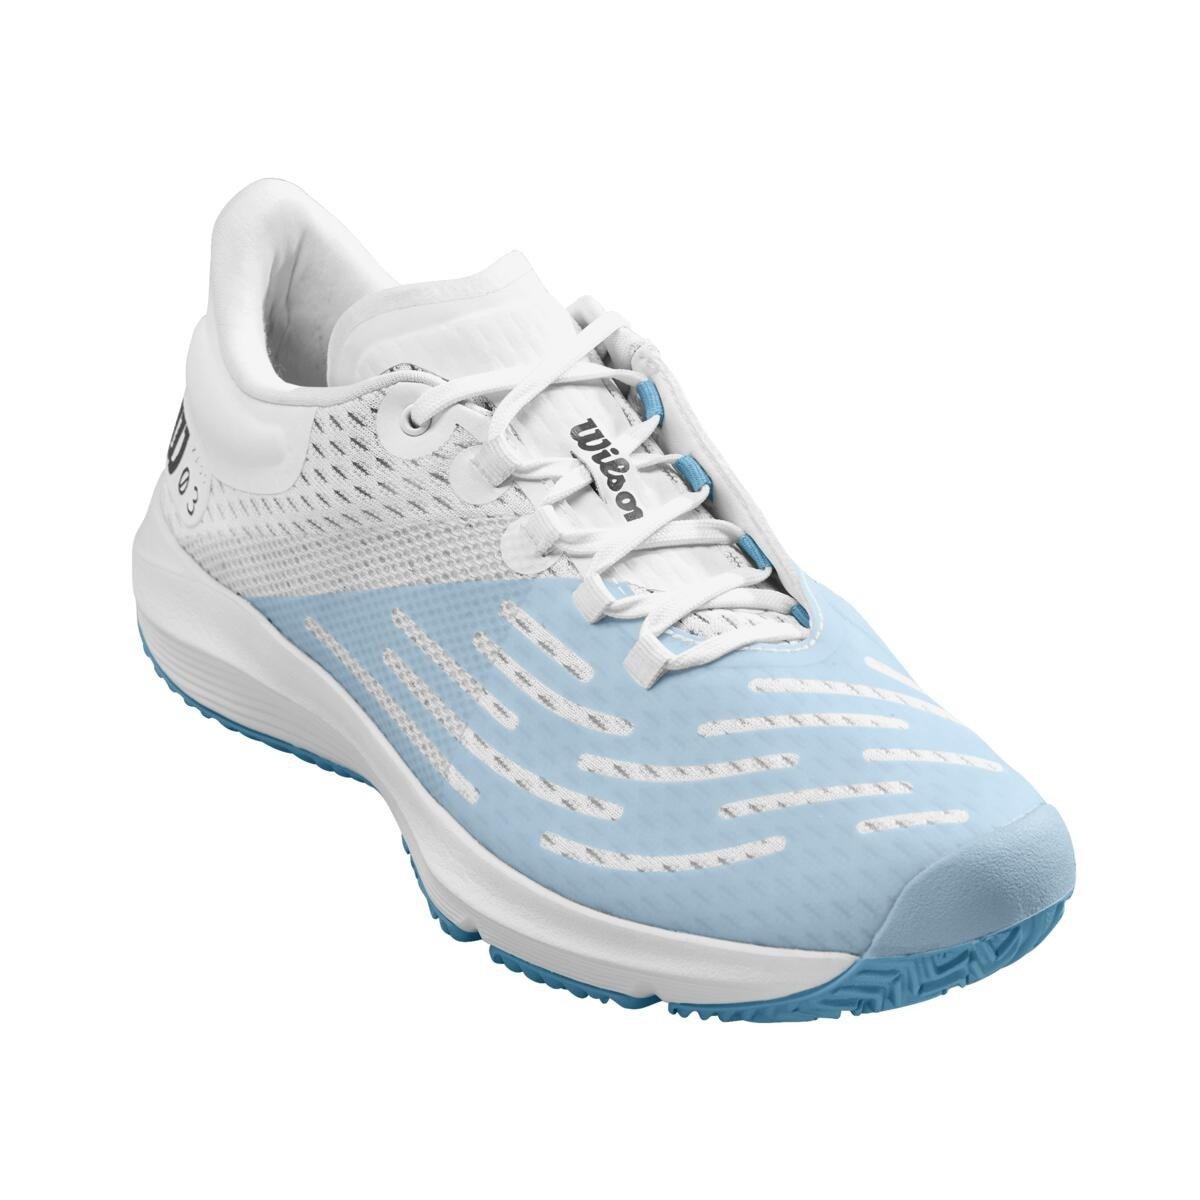 Wilson Tennis Shoes – Women's Kaos 3.0 (White & Blue)